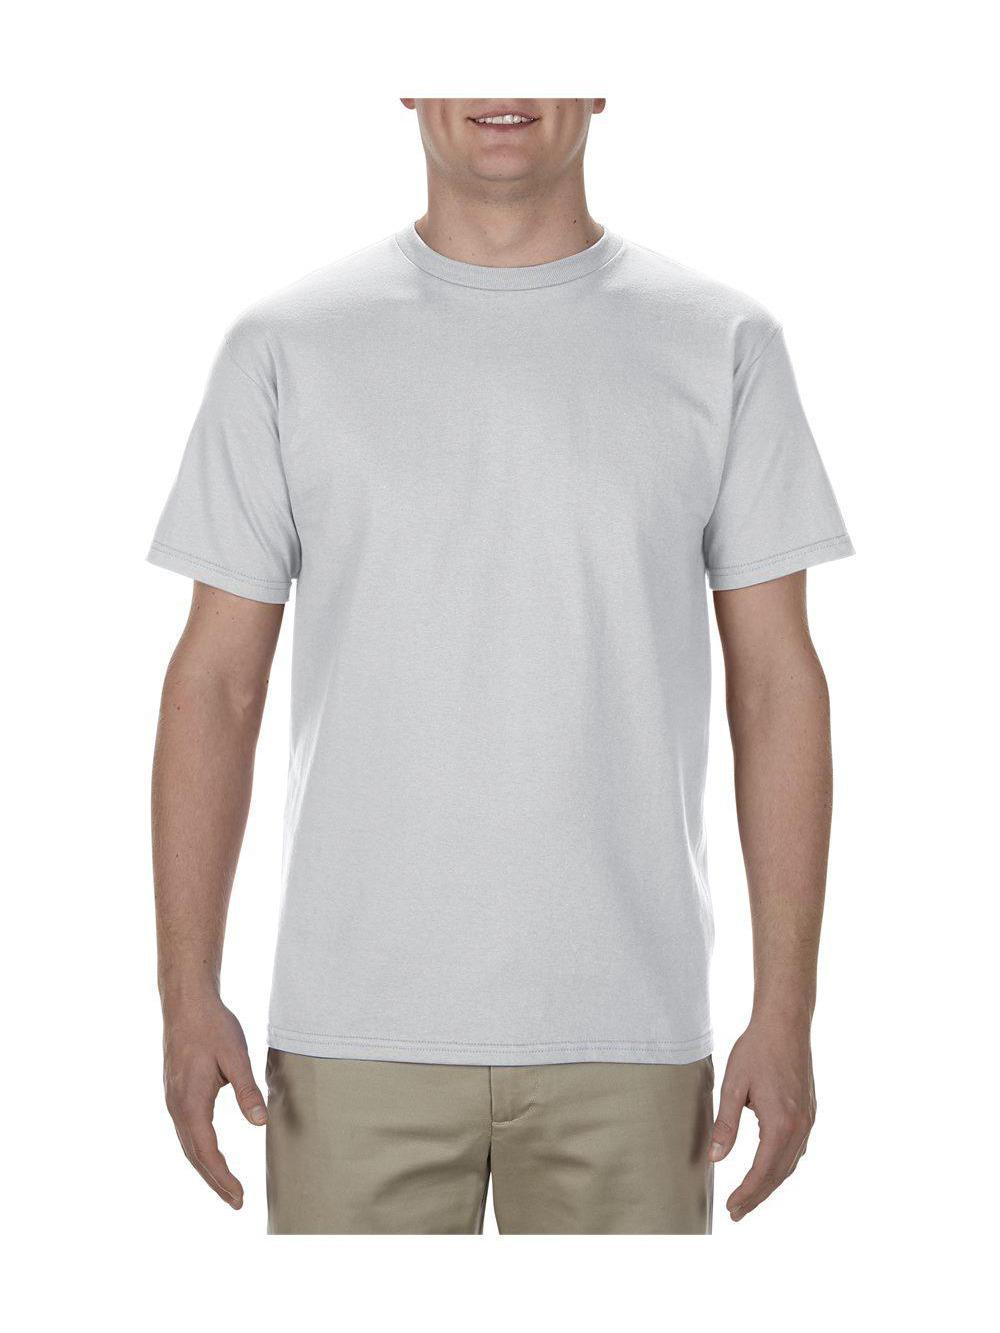 ALSTYLE-Premium-T-Shirt-1701 thumbnail 58